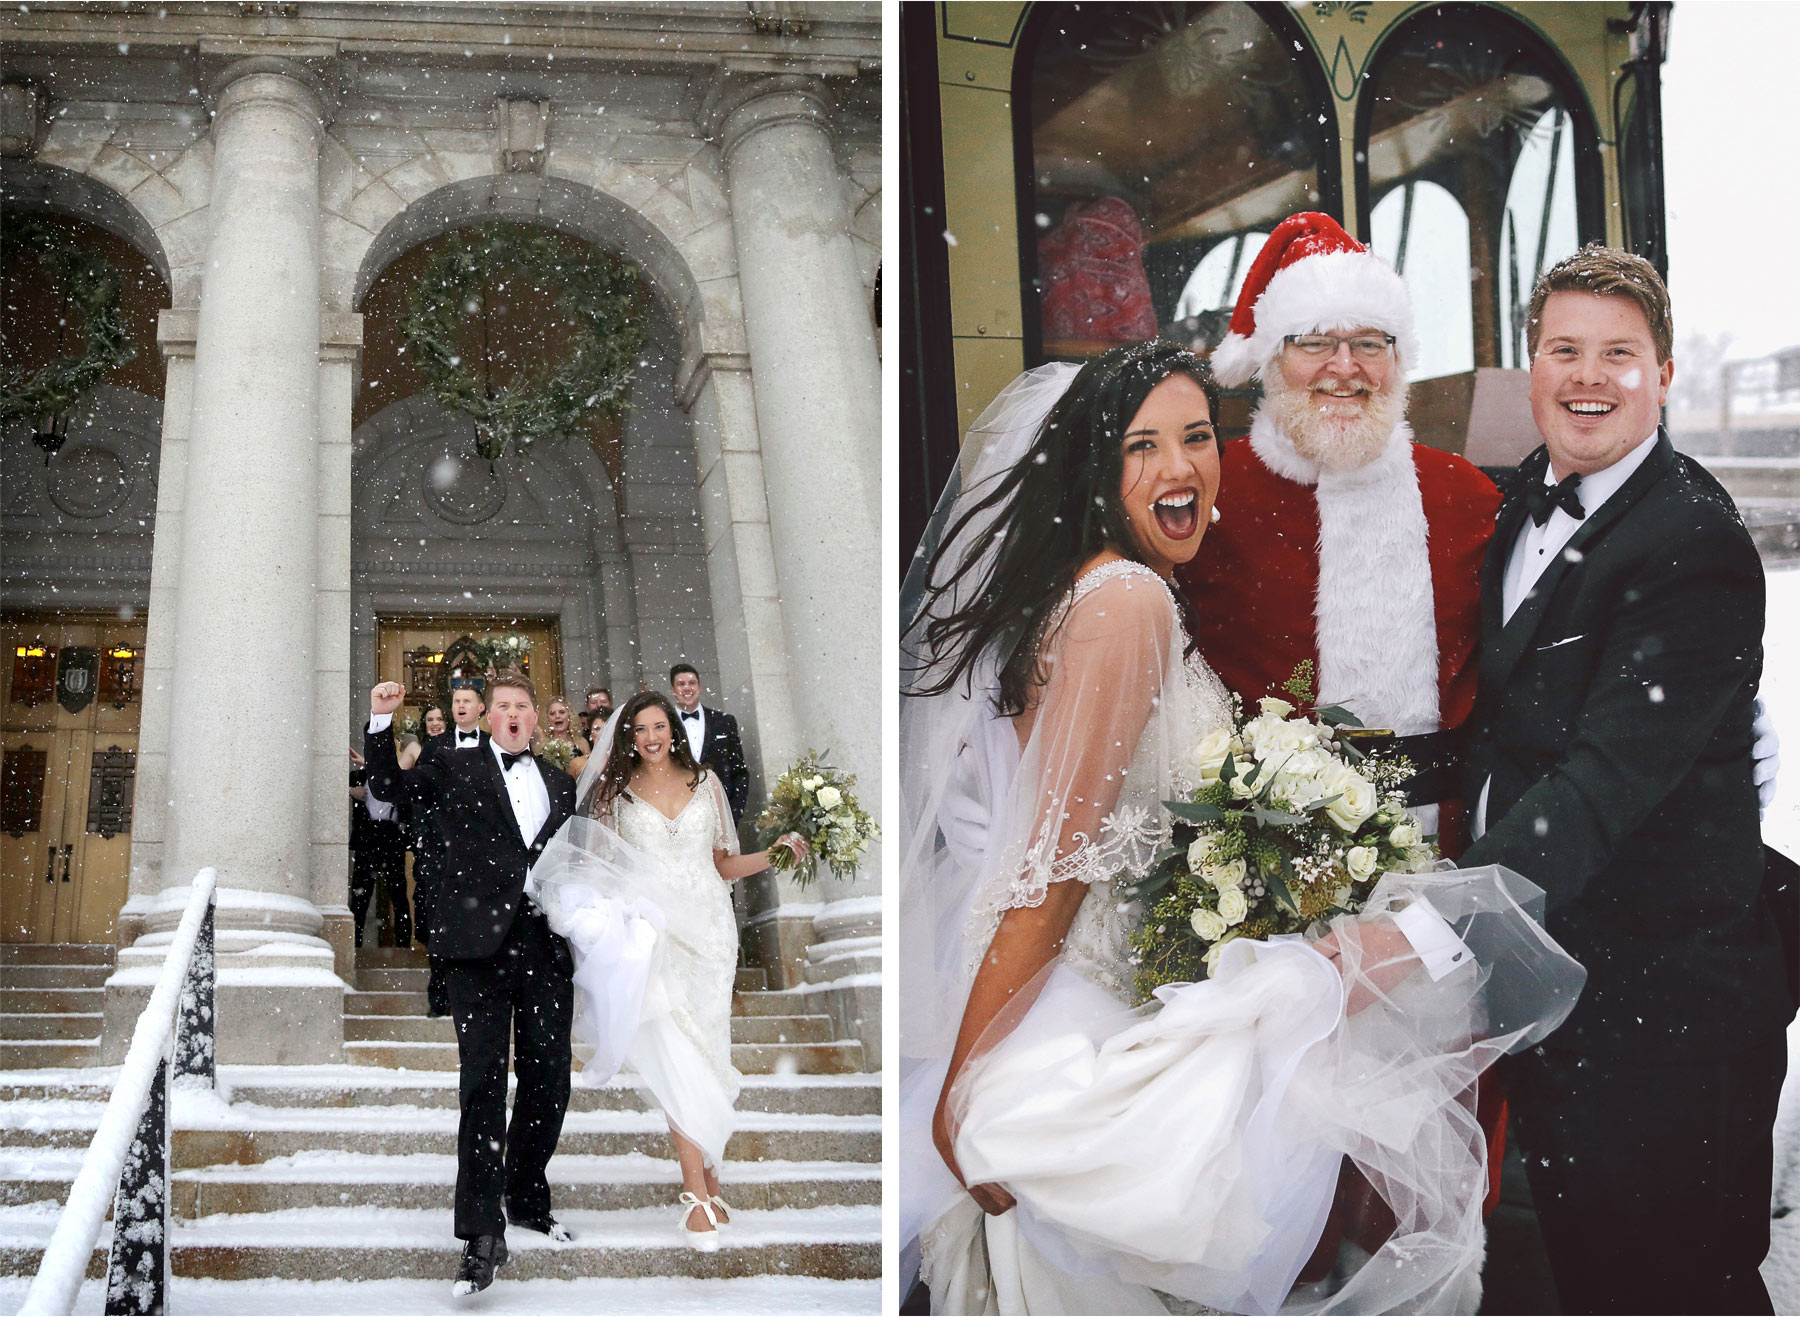 15-Saint-Paul-Minnesota-Wedding-Photography-by-Vick-Photography-Wedding-Party-Group-Trolley-Snow-Storm-Santa-Winter-Wedding-Sami-and-Nick.jpg